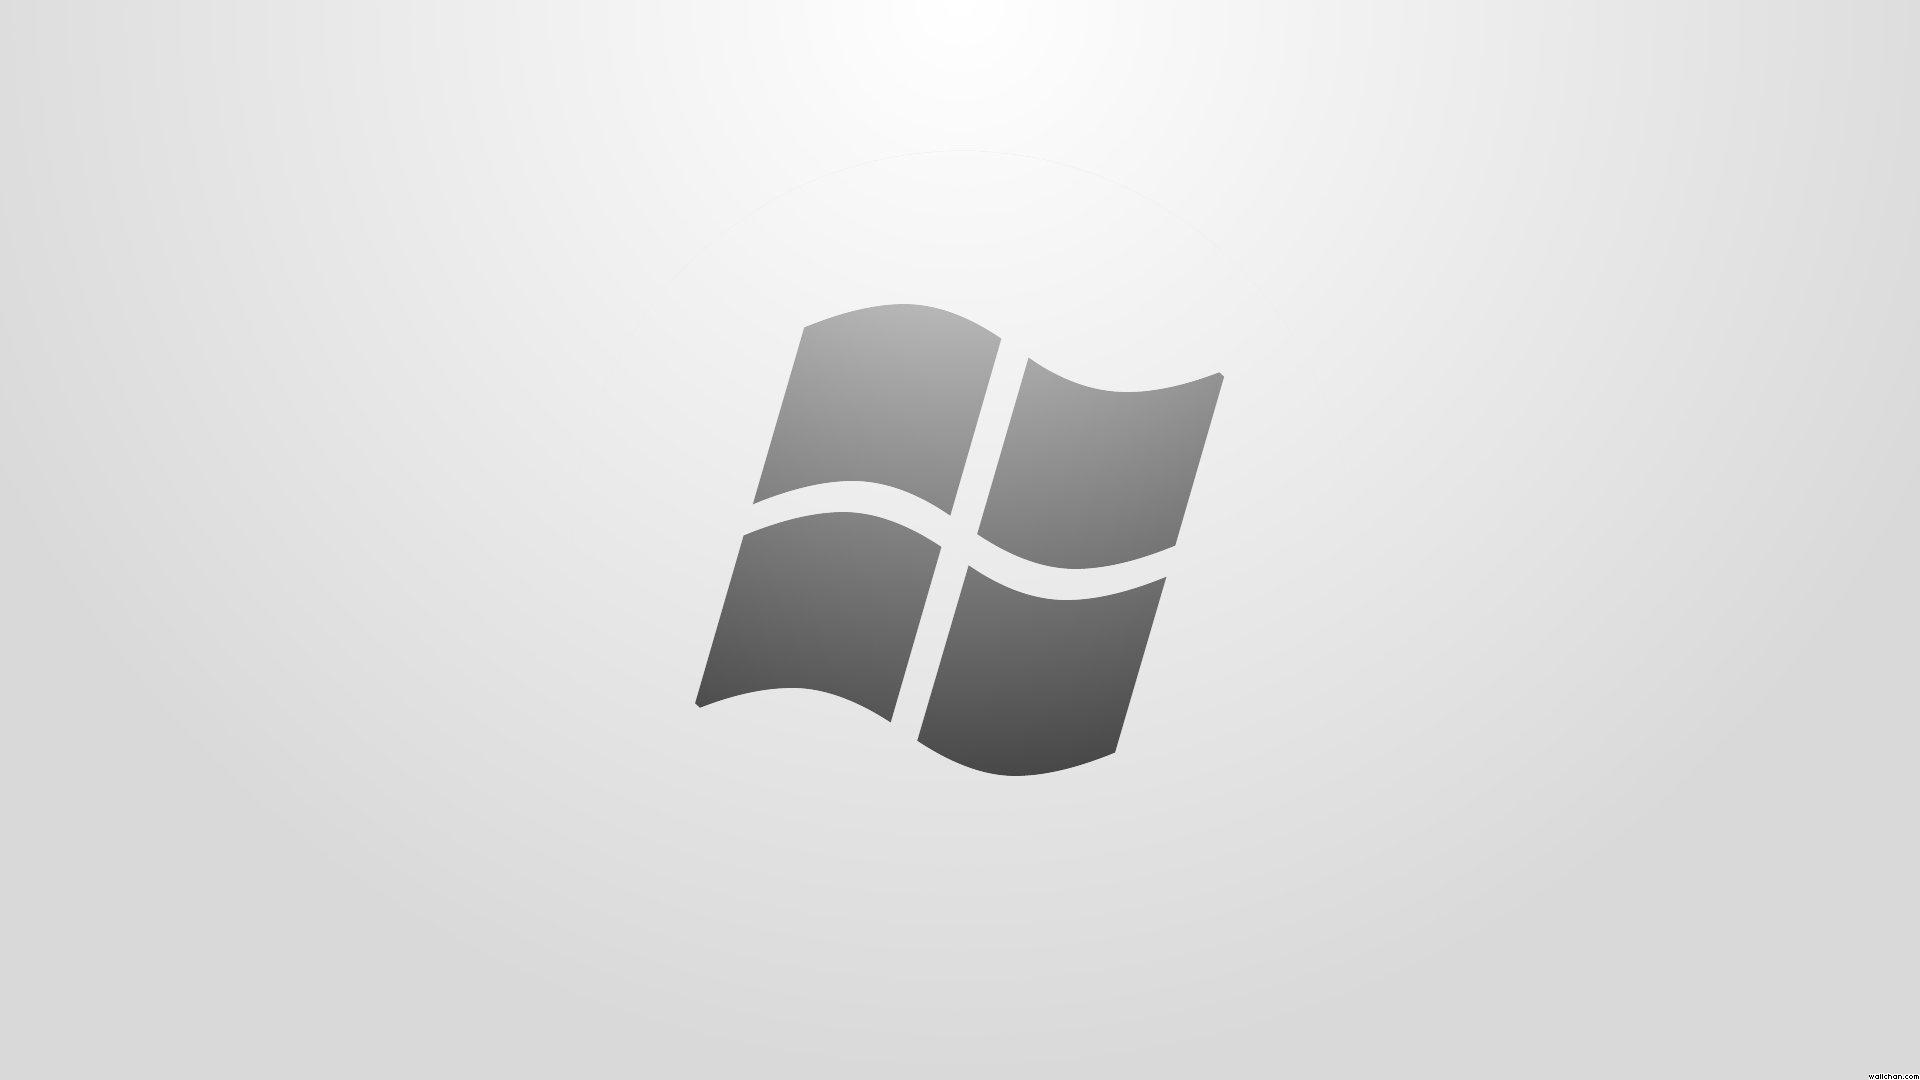 Windows Icon HD Wallpaper